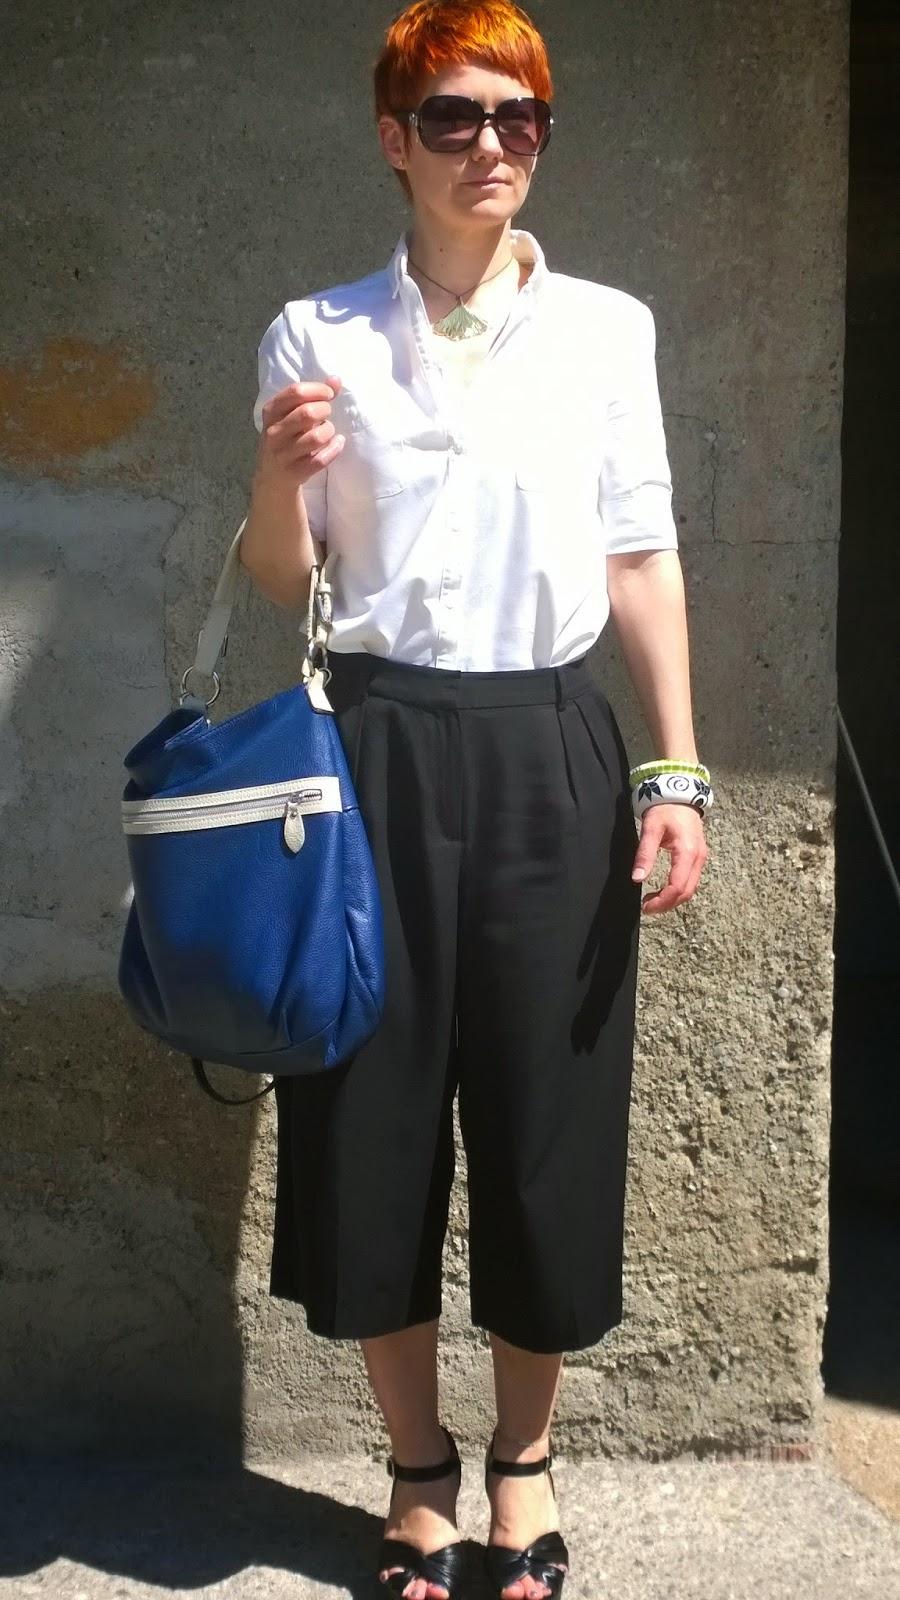 Mango shirt and pants, evil blue bag